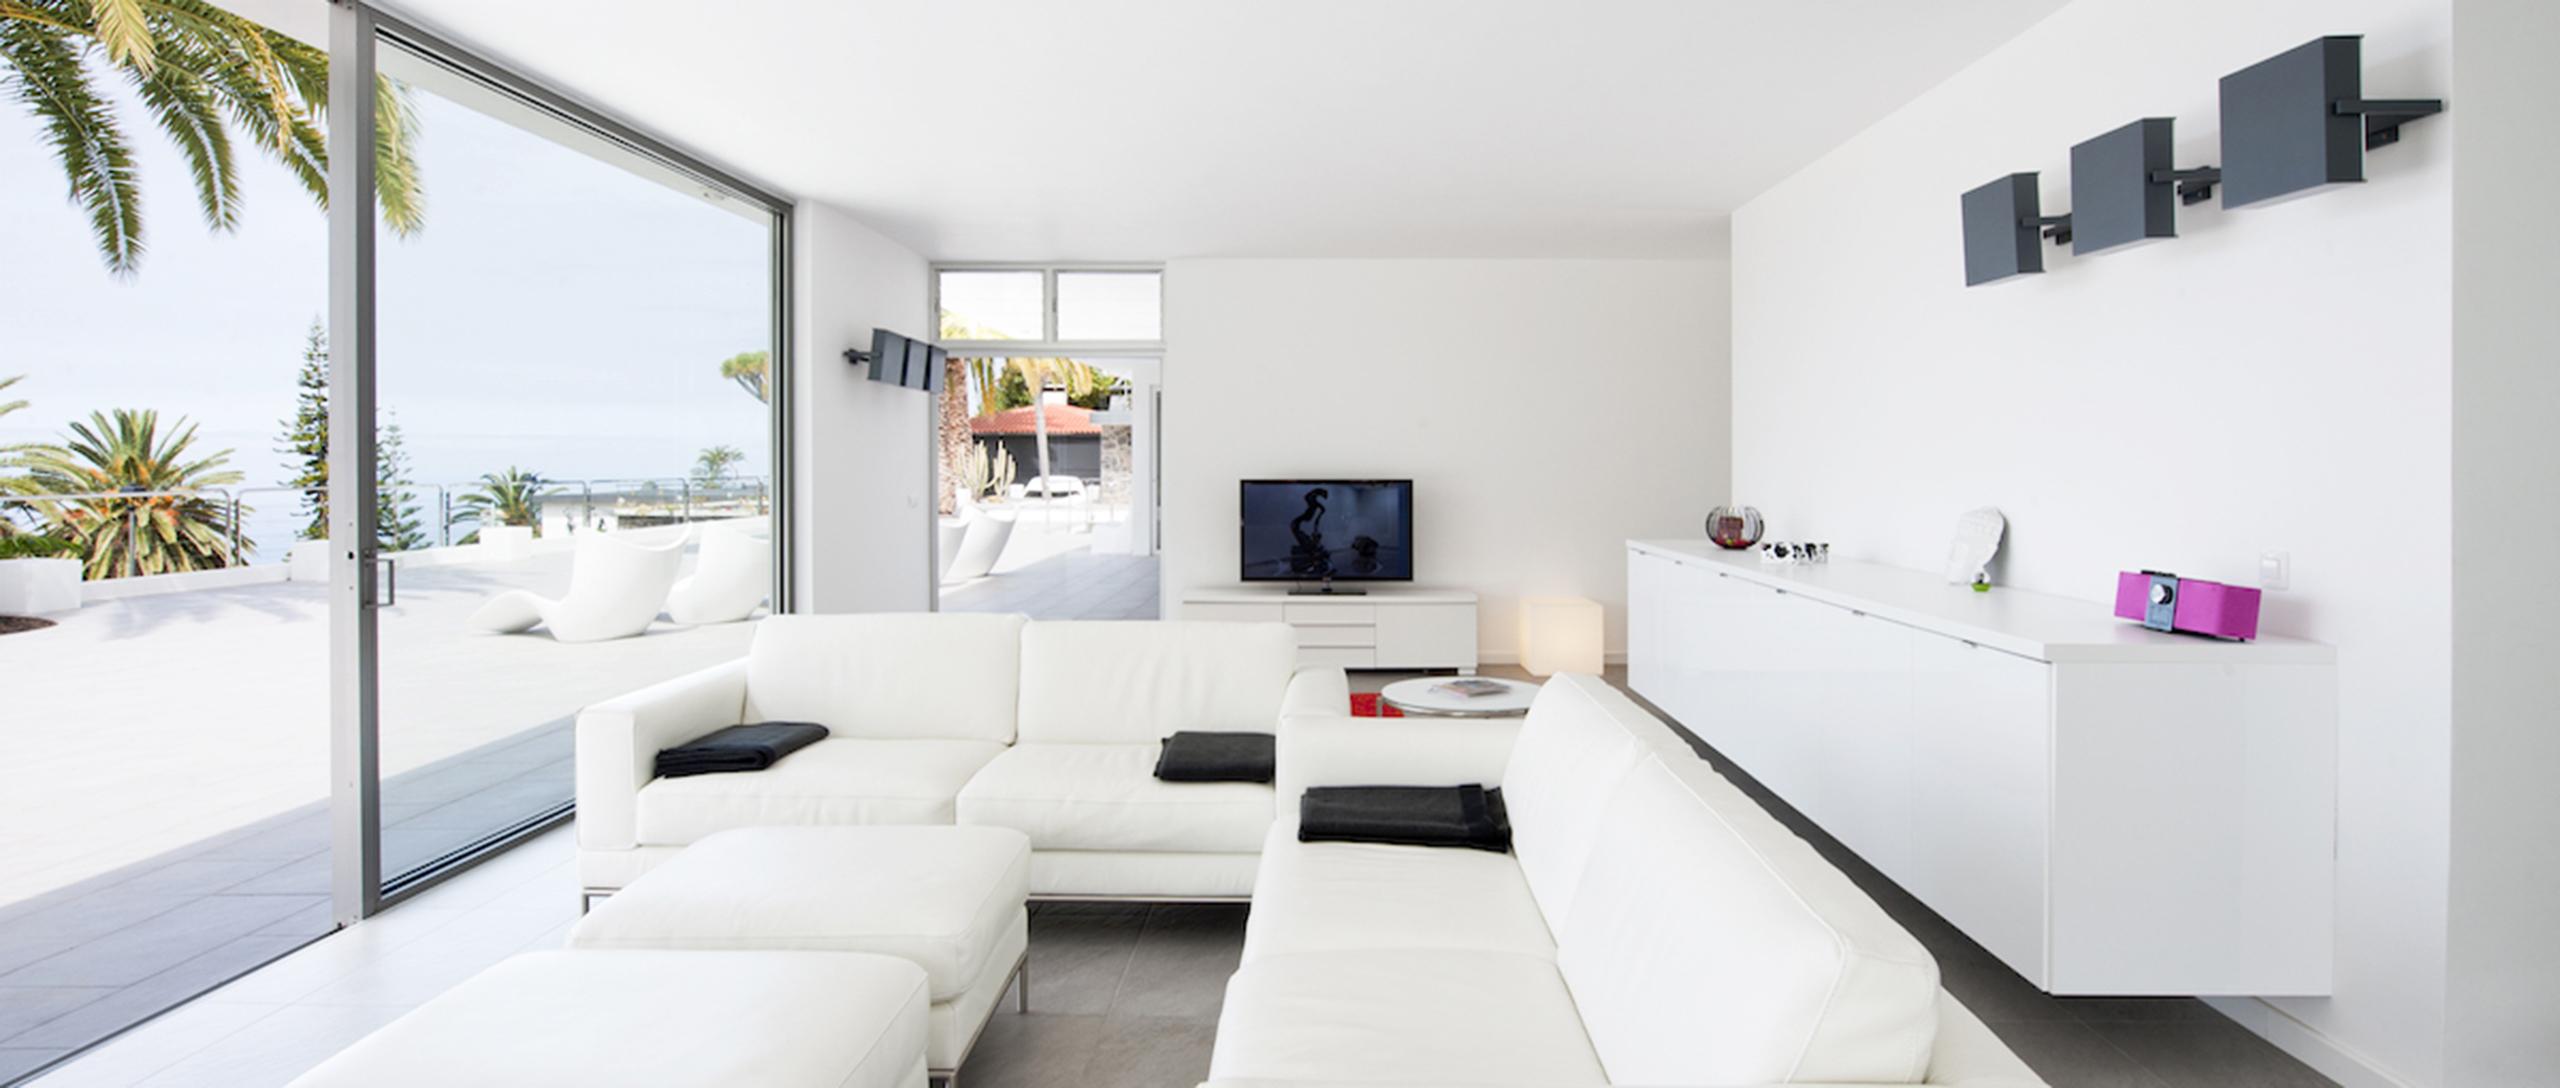 fotografia de arquitectura interior